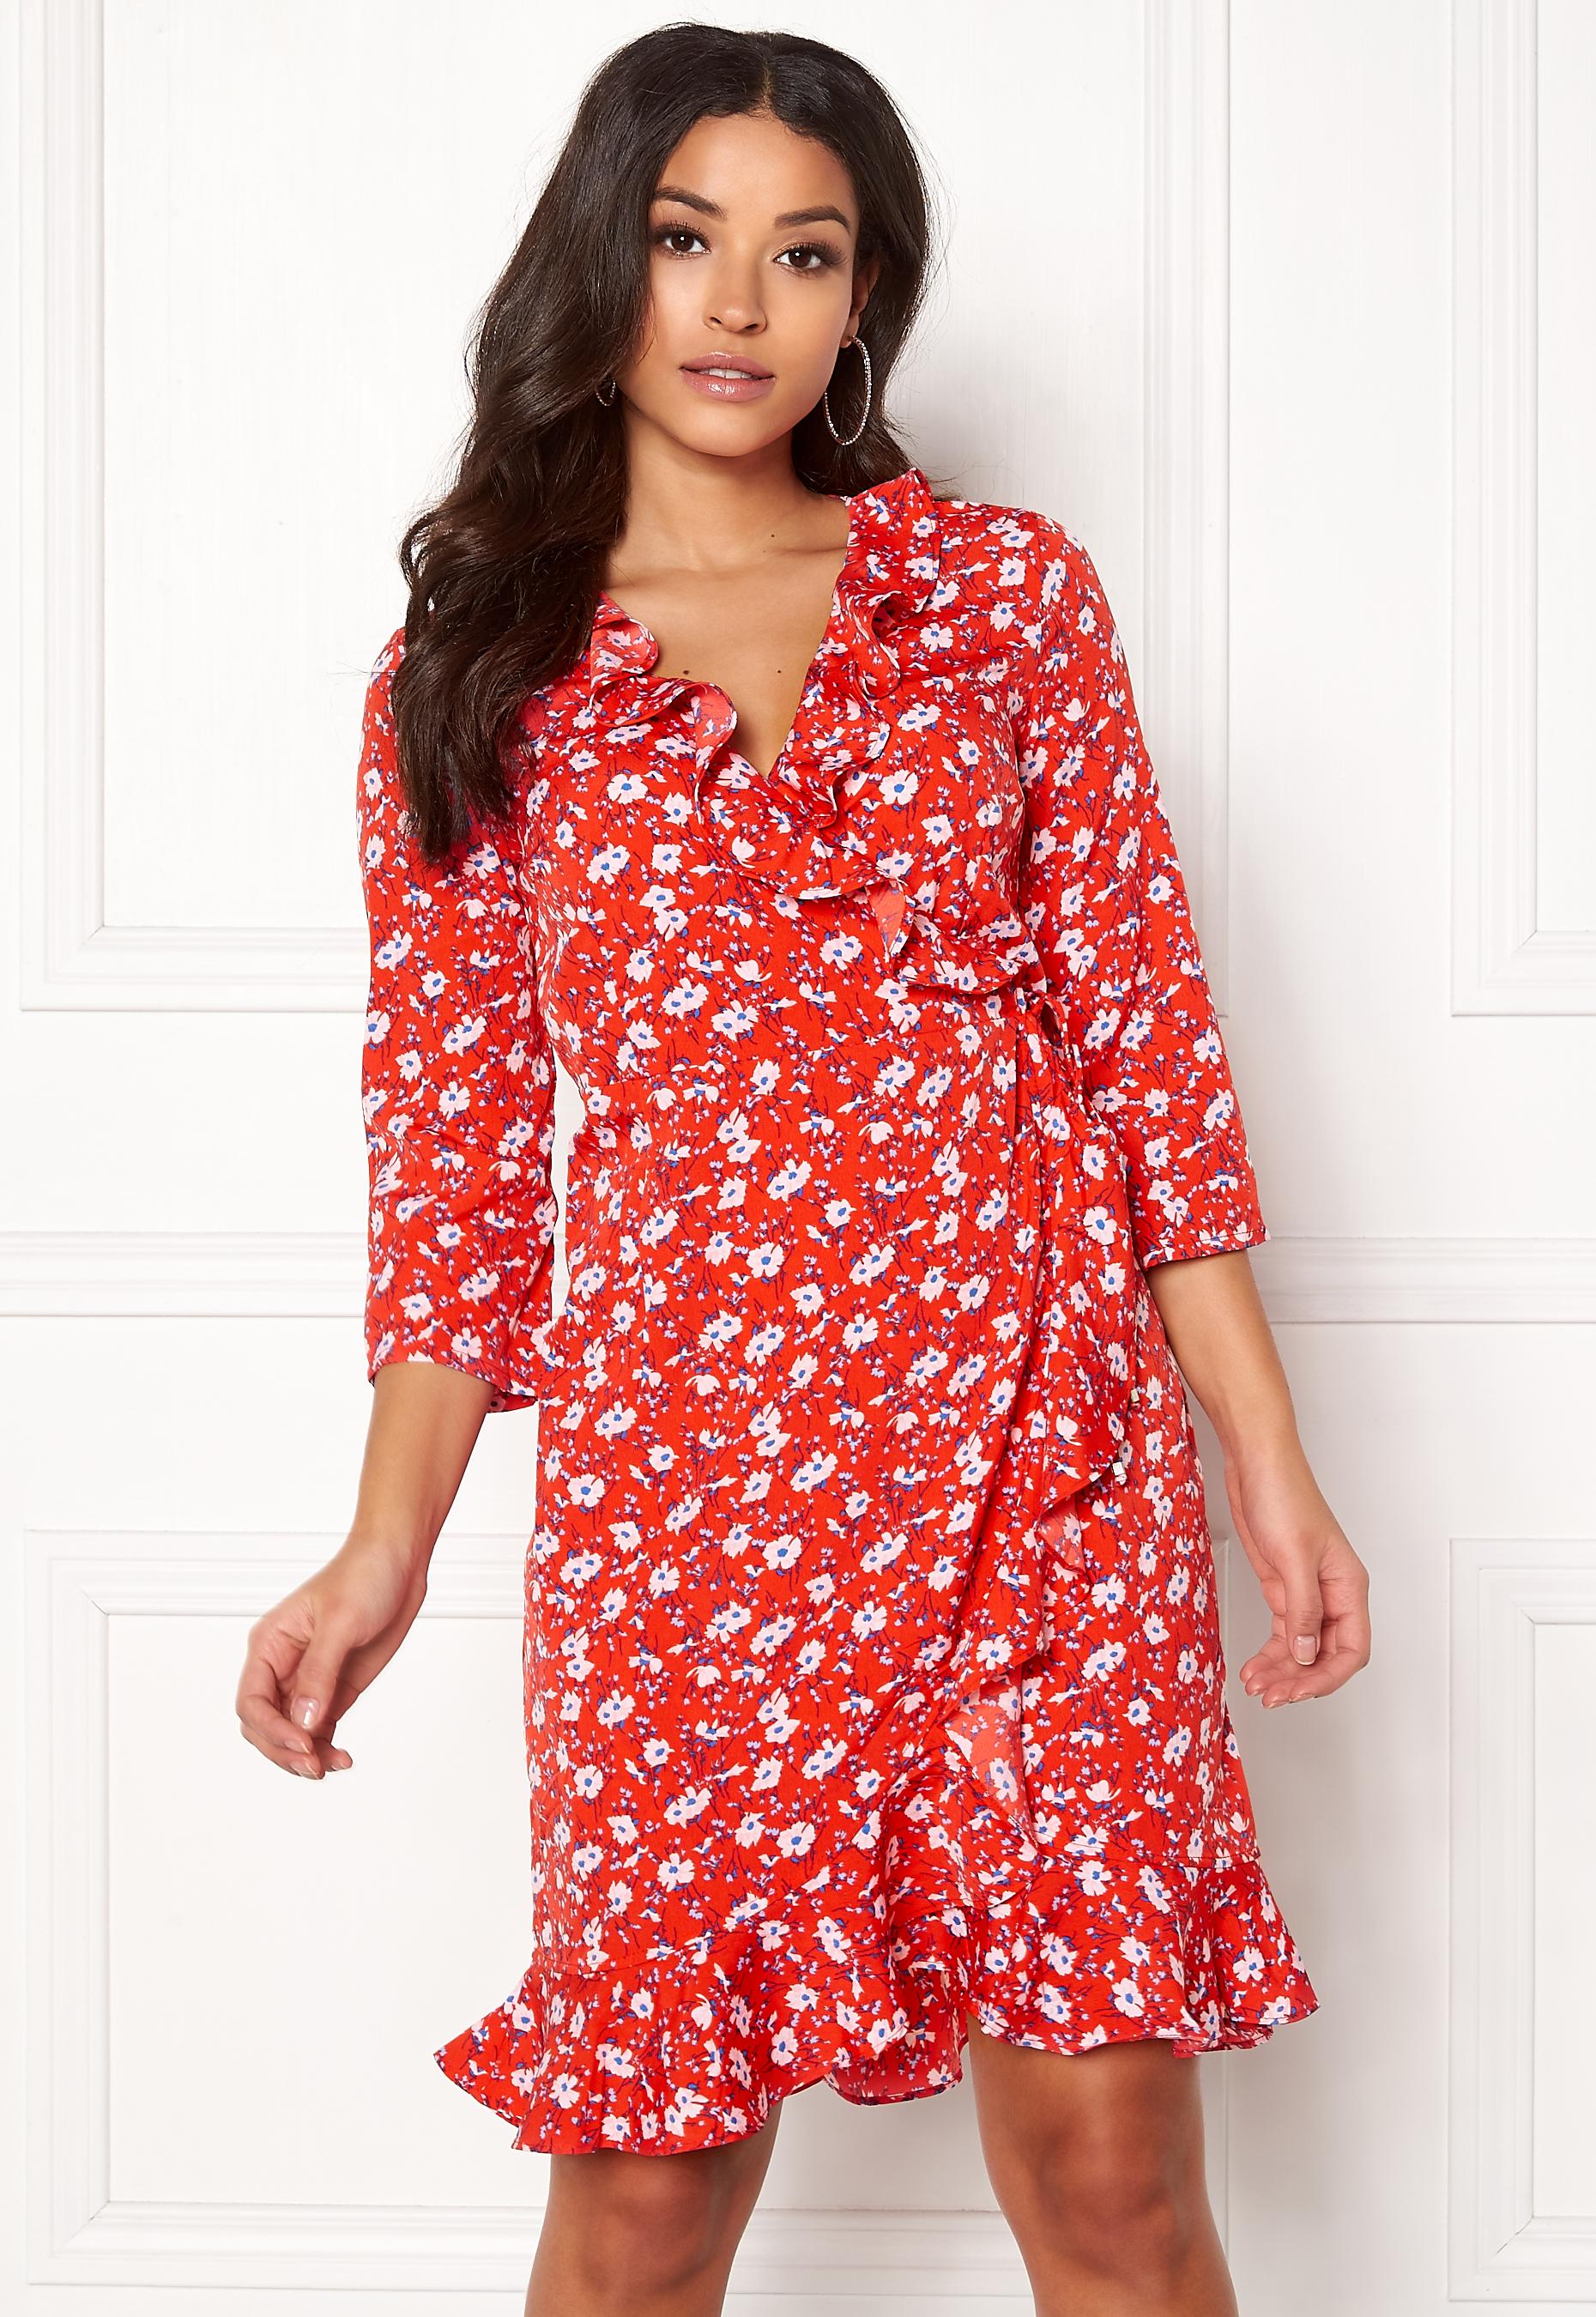 ed691fd1192 VERO MODA Molly Poly 3/4 Wrap Dress Poppy Red - Bubbleroom